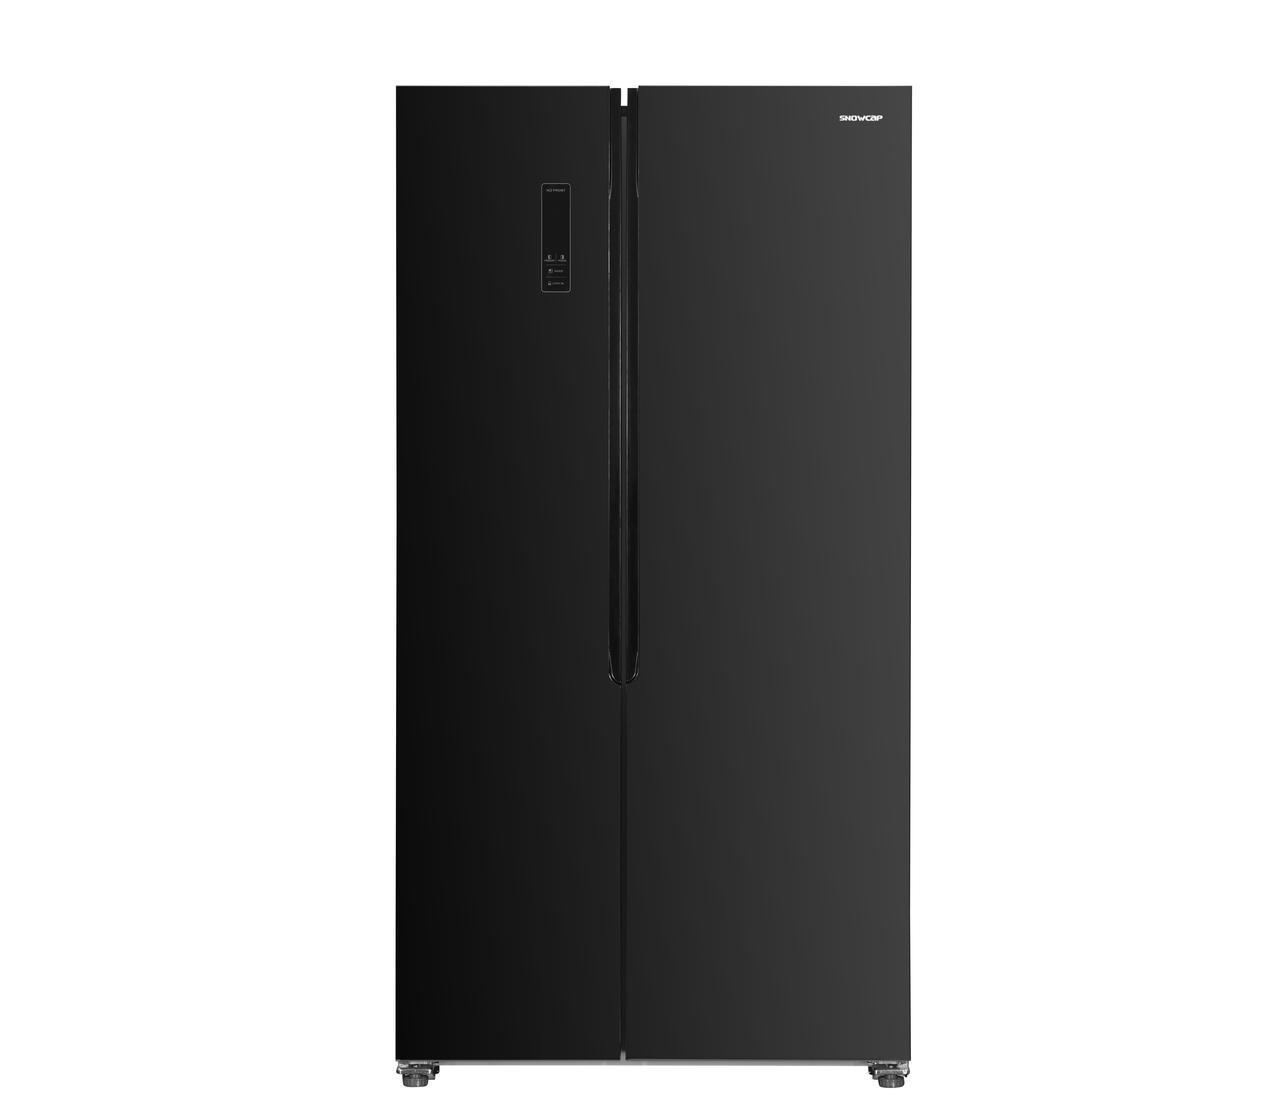 Холодильник SNOWCAP SBS NF 472 BG